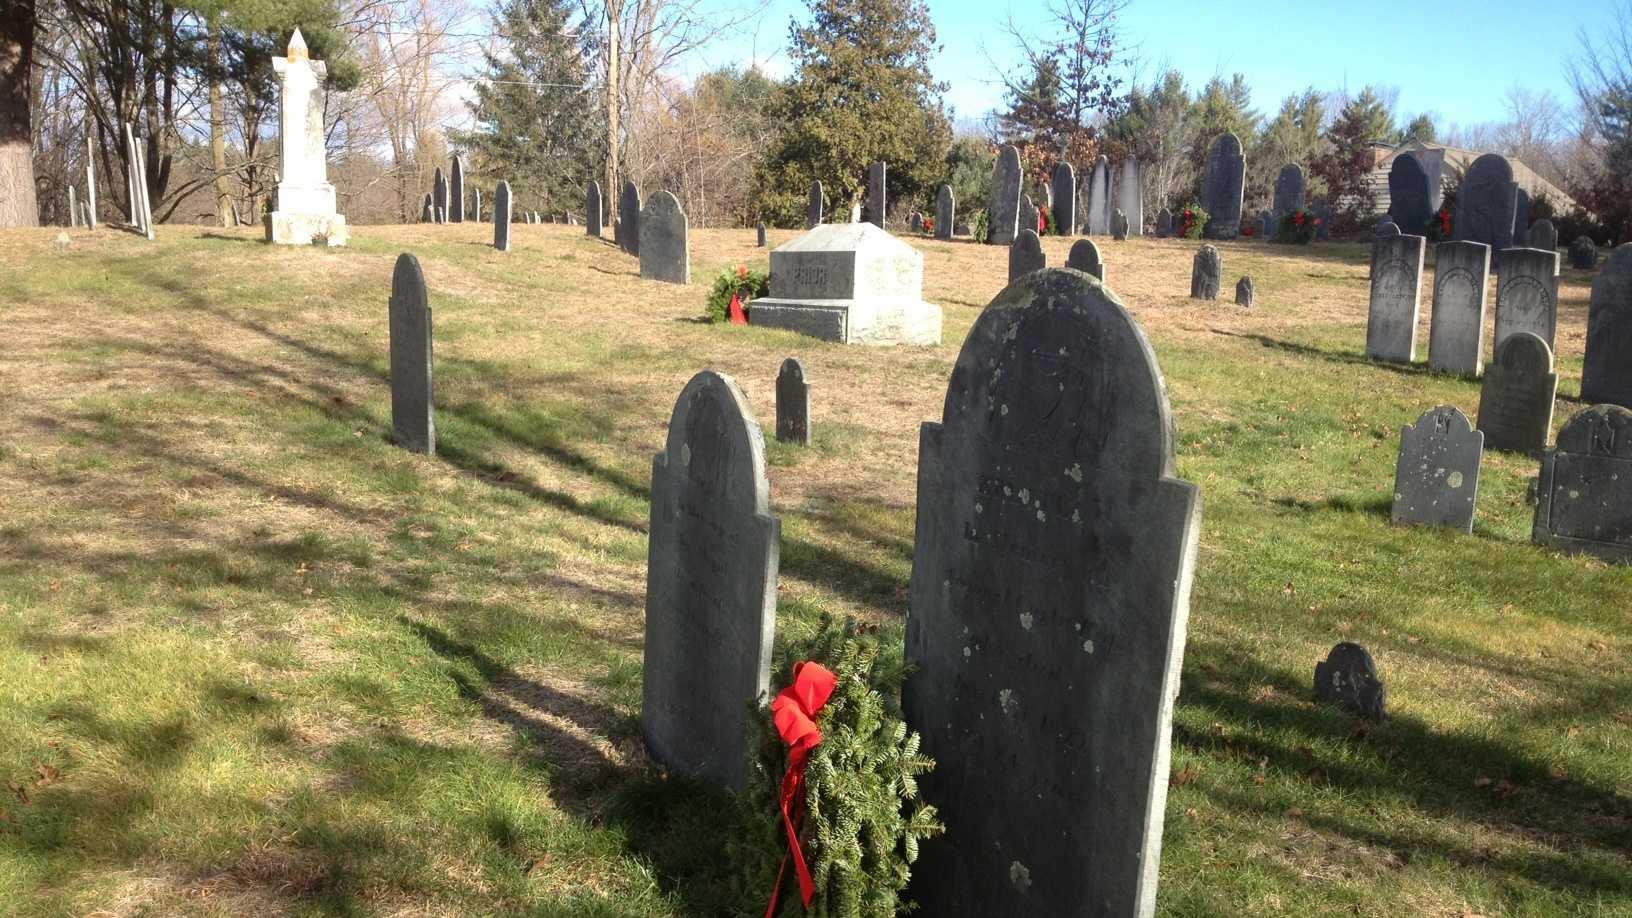 Wreaths laid on veterans' graves